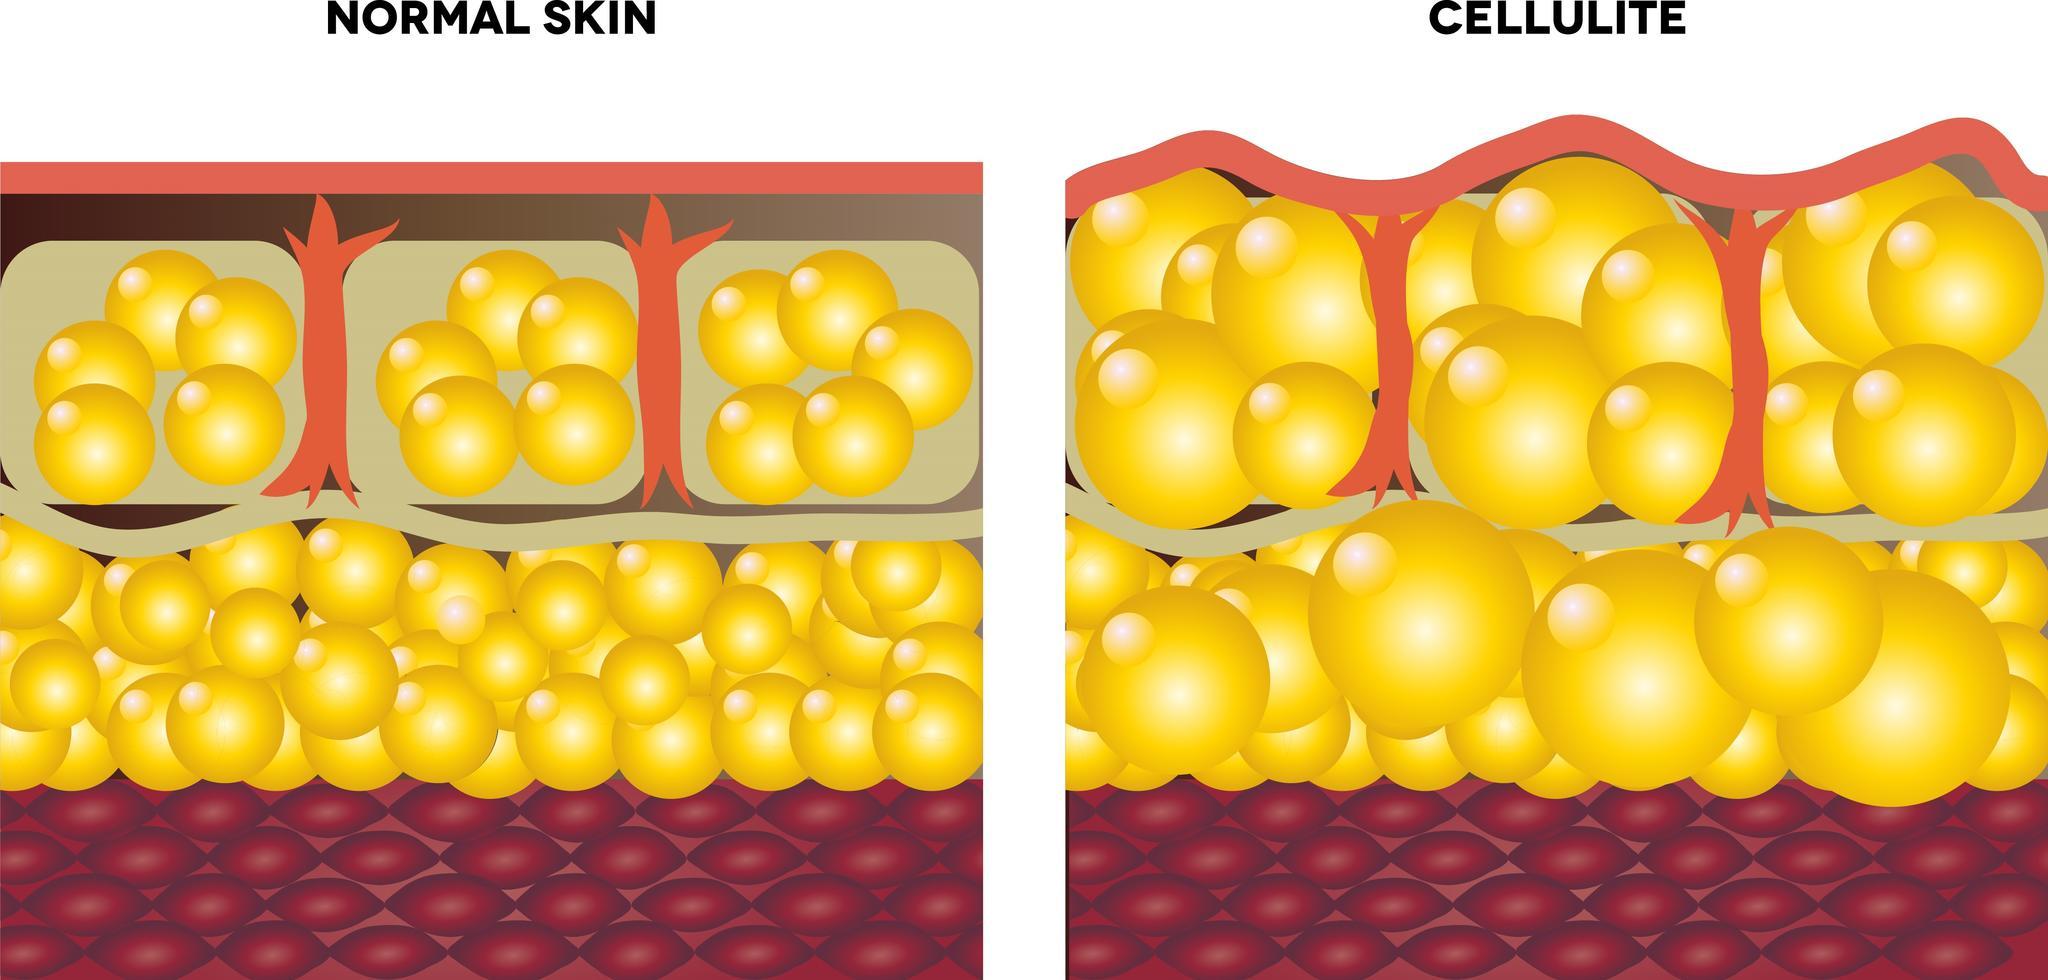 uitleg cellulitis